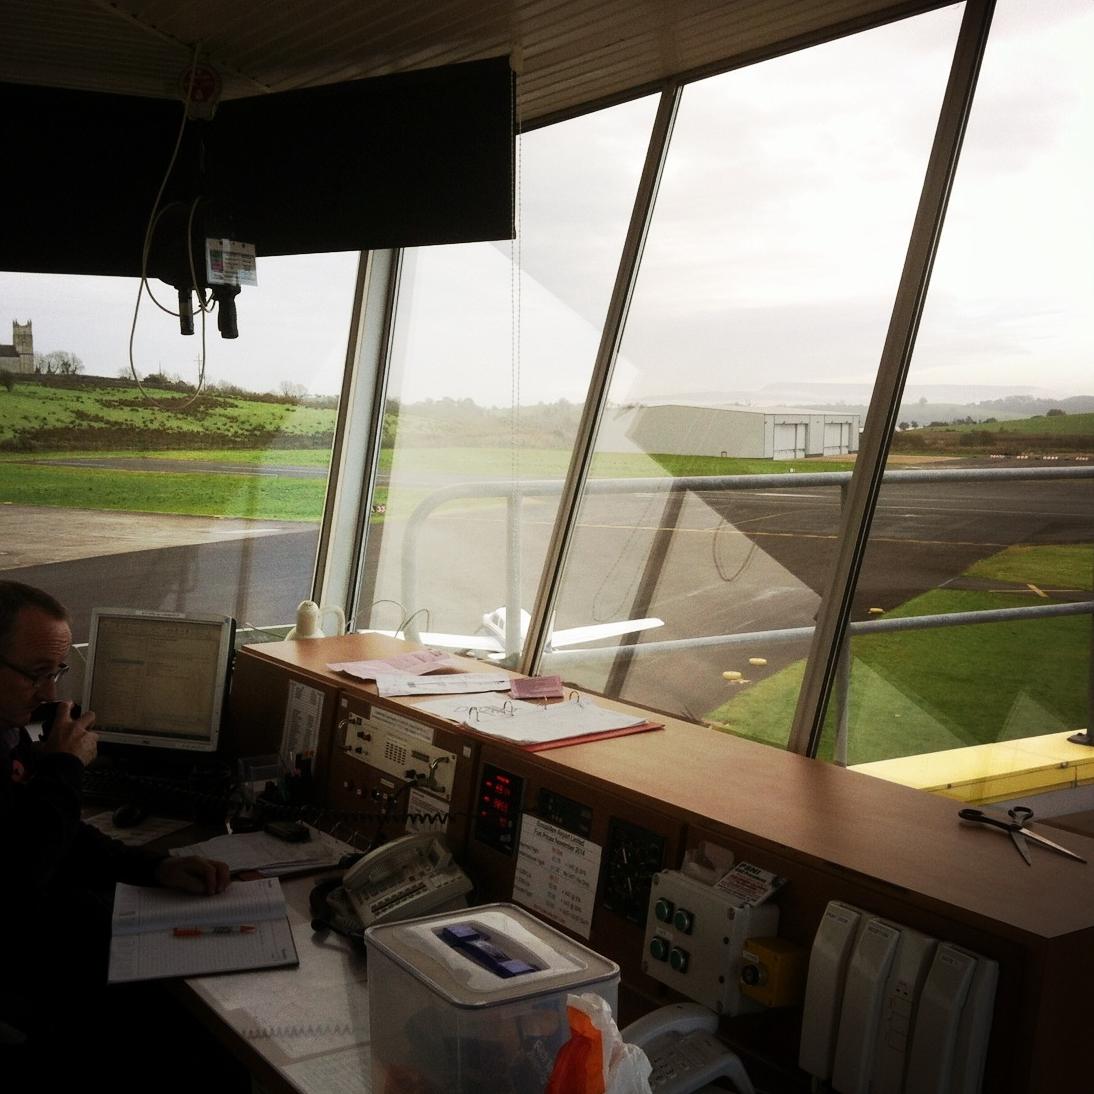 Noel Baskin at the Controls, St Angelo Airport, Enniskillen (Sound Ark 2014)